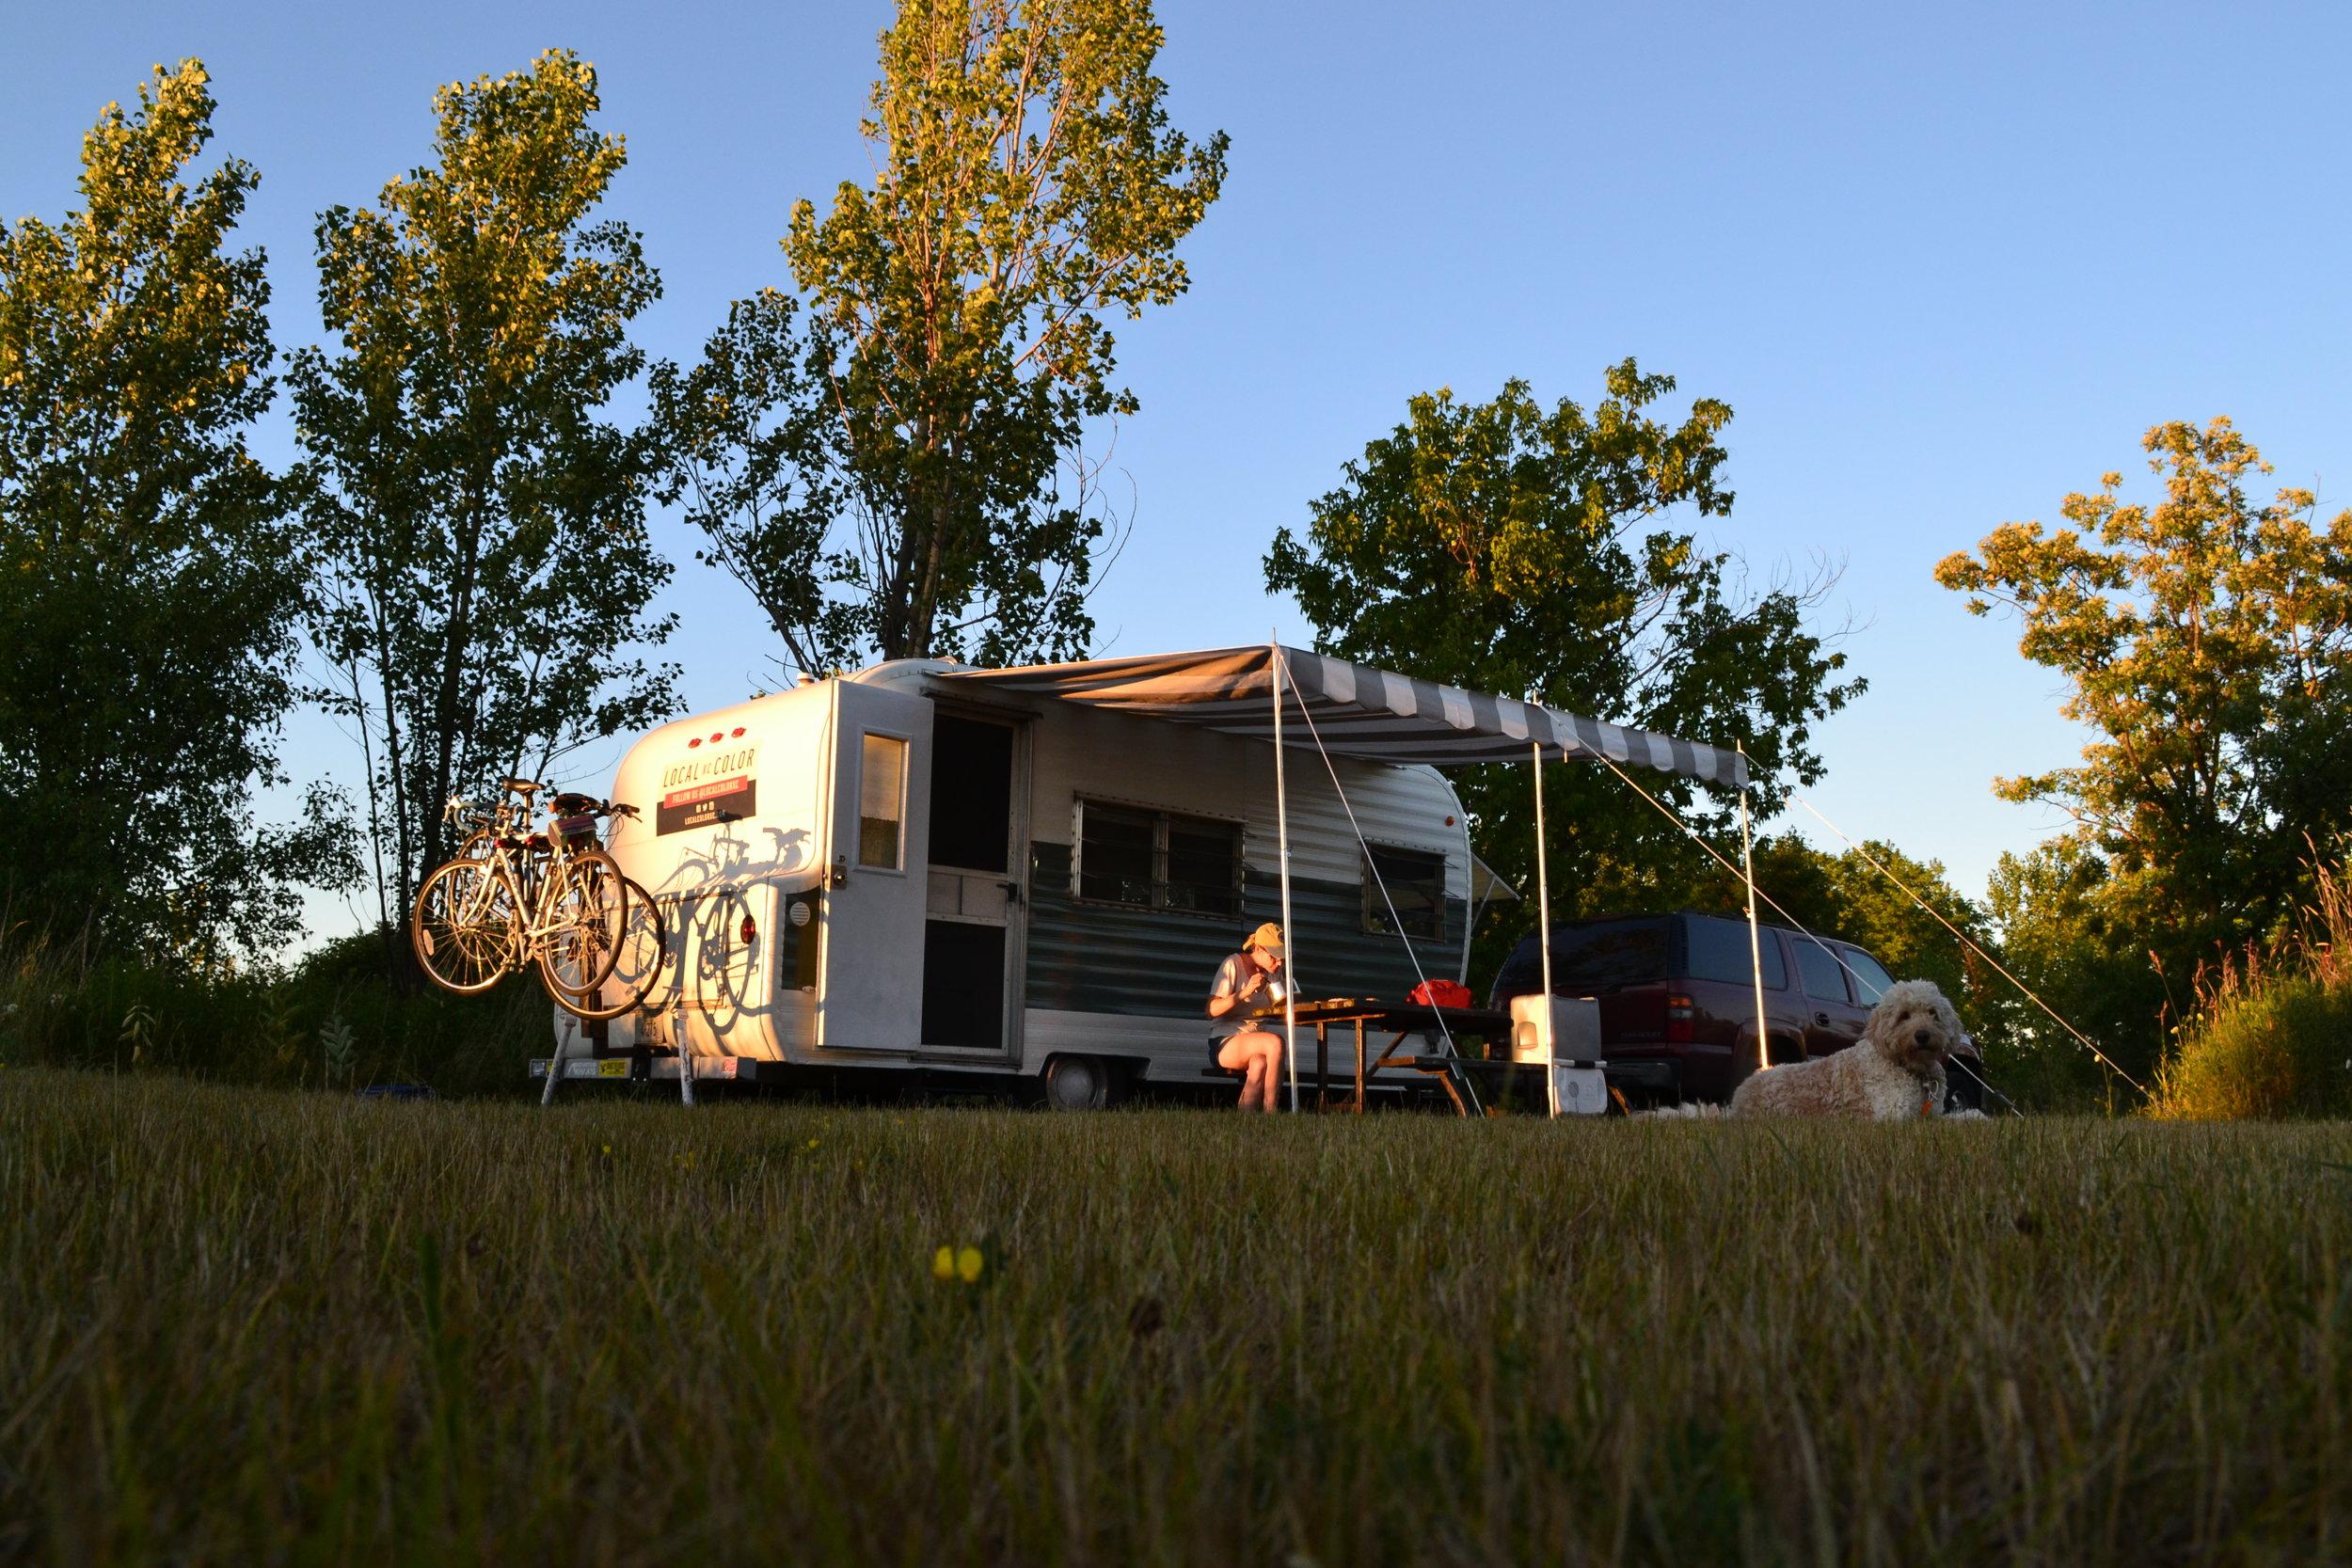 Our campsite at Bronte Creek Provincial Park.